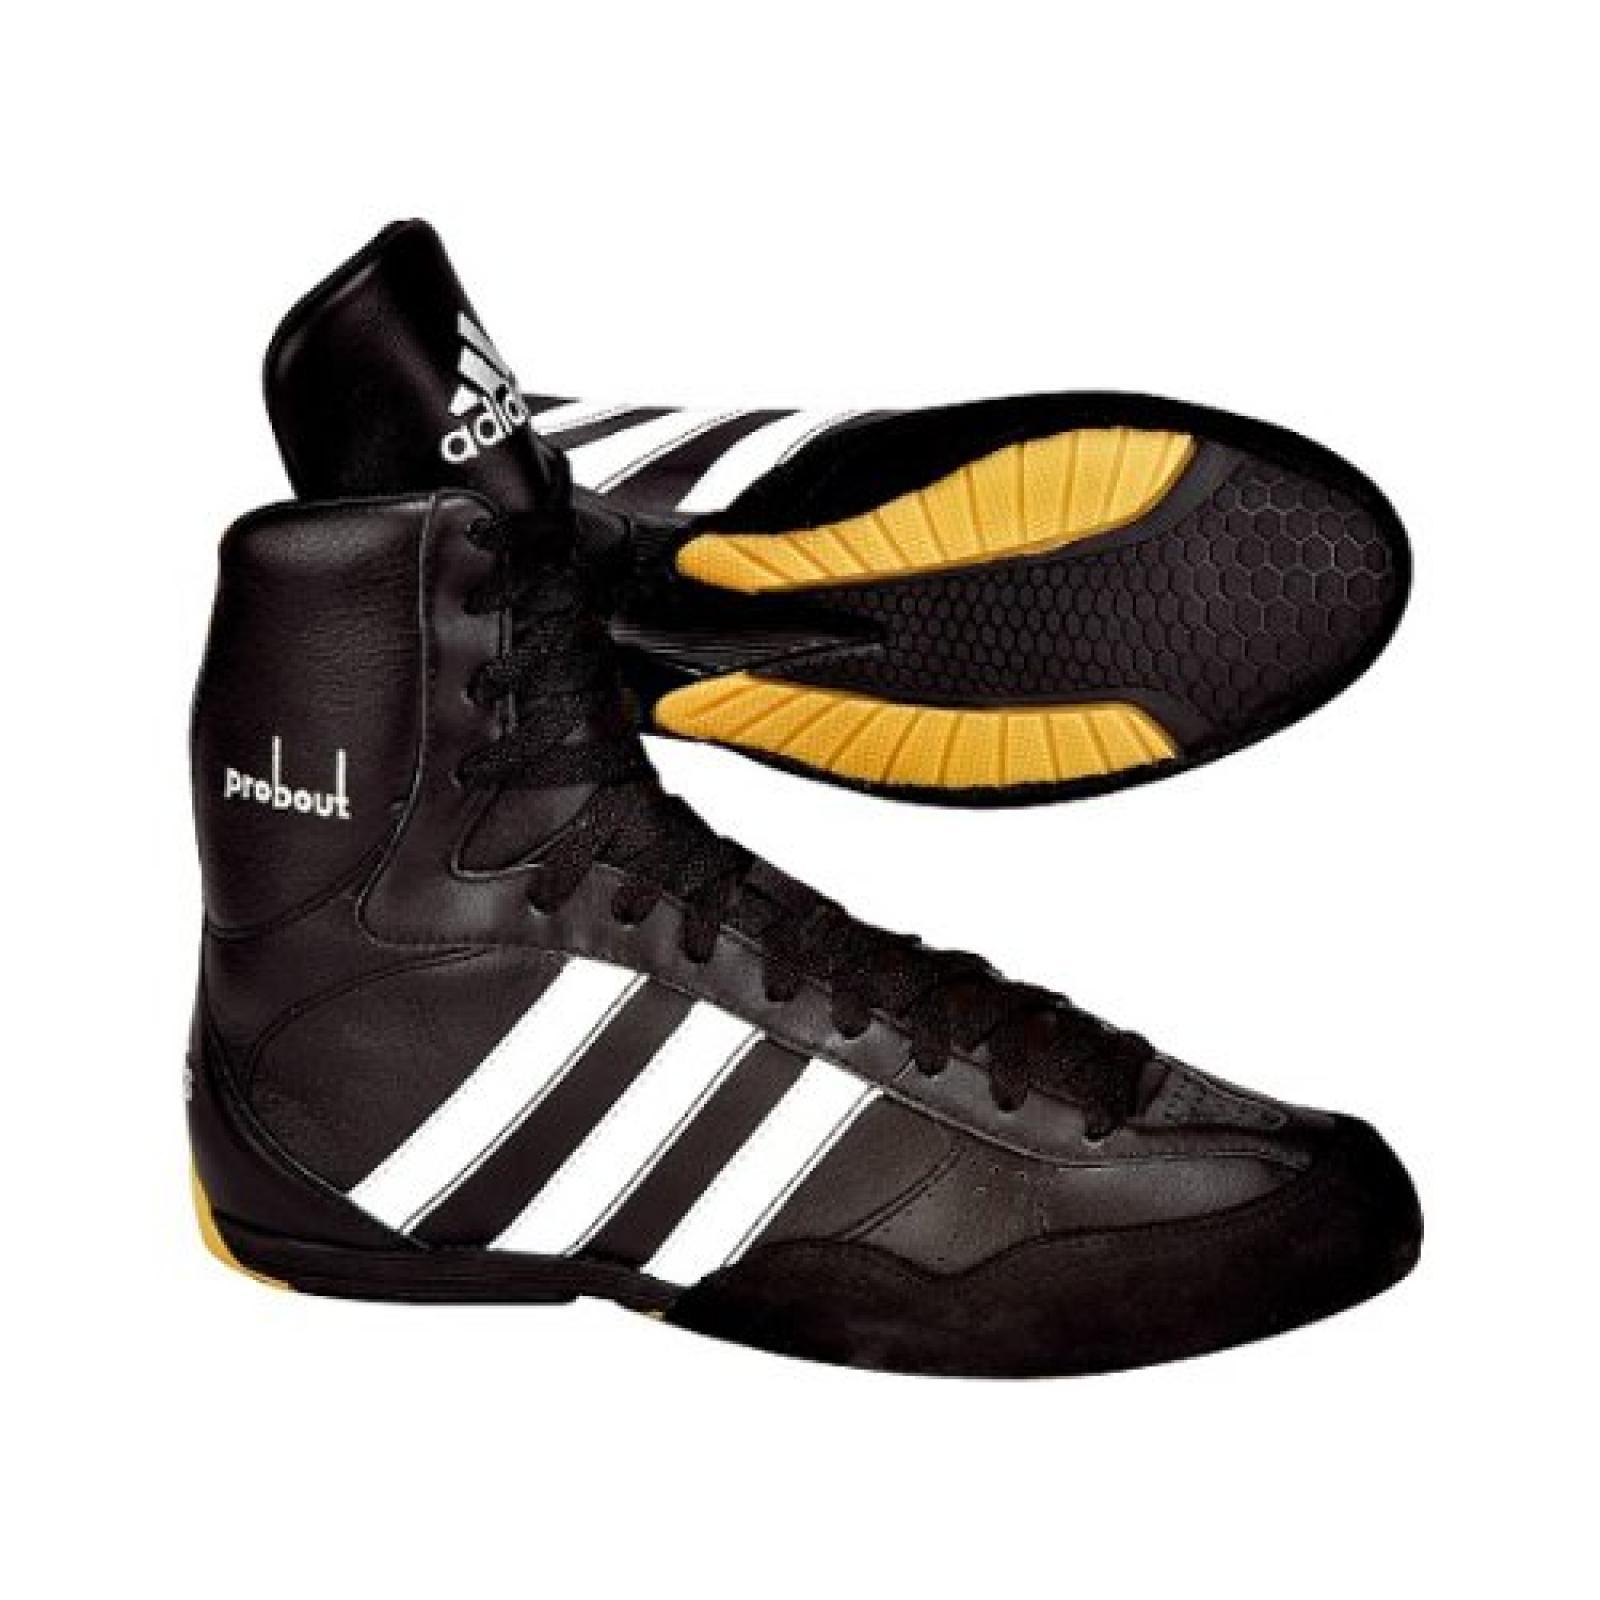 adidas Probout Boxing Shoes -9